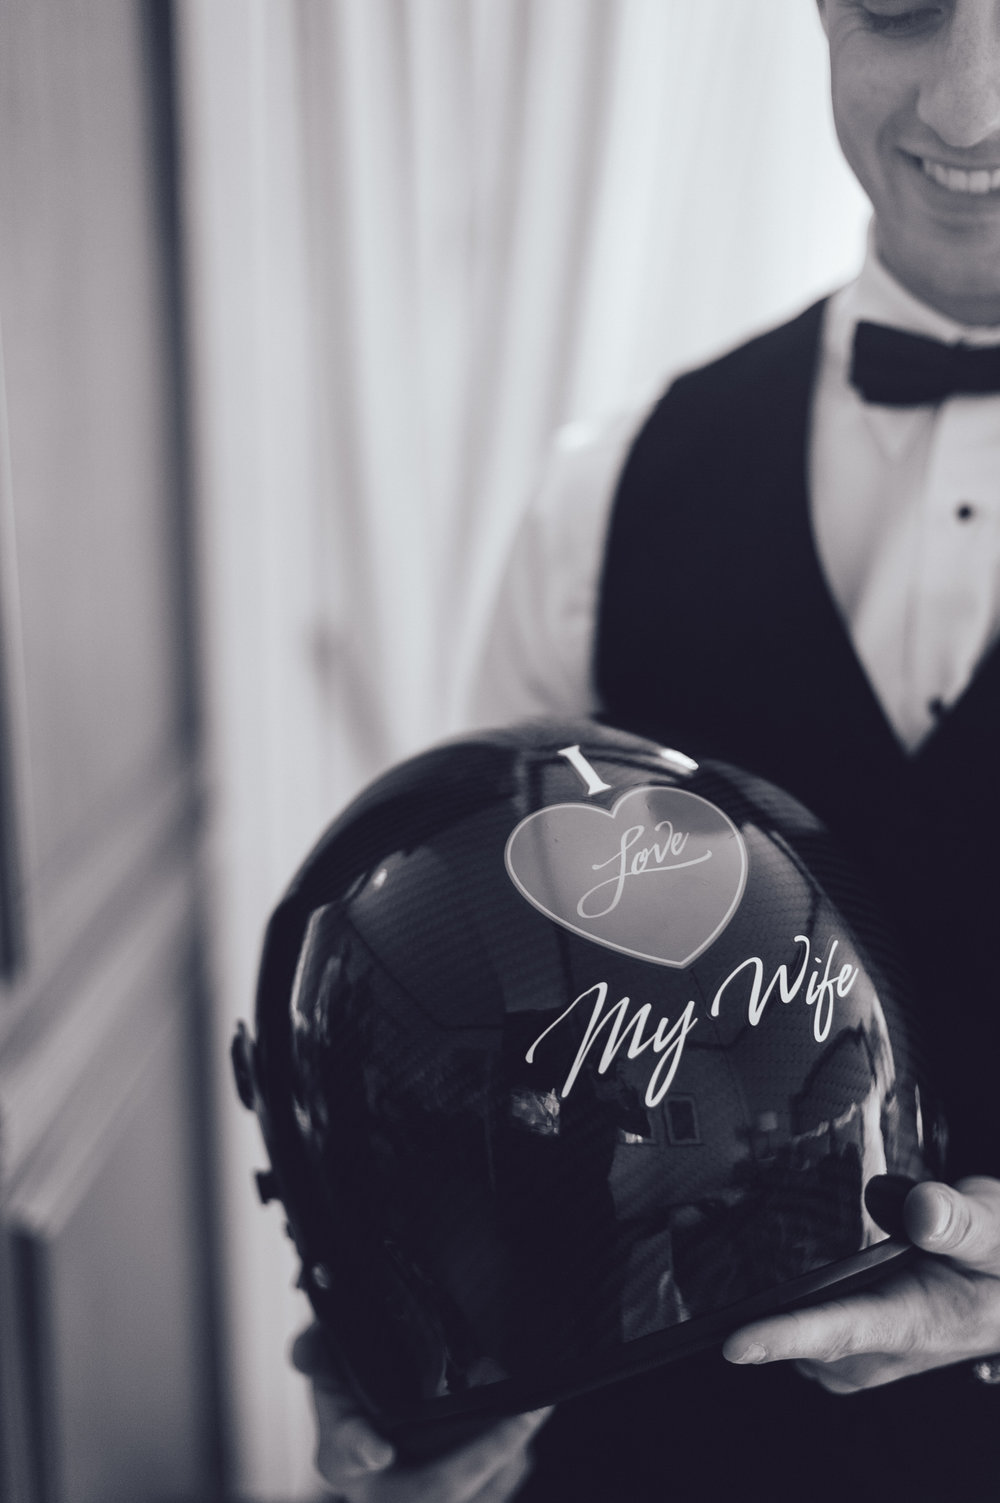 08 Racecar Driver Grooms Gift Hotel Dupont Wedding Aribella Events.jpg